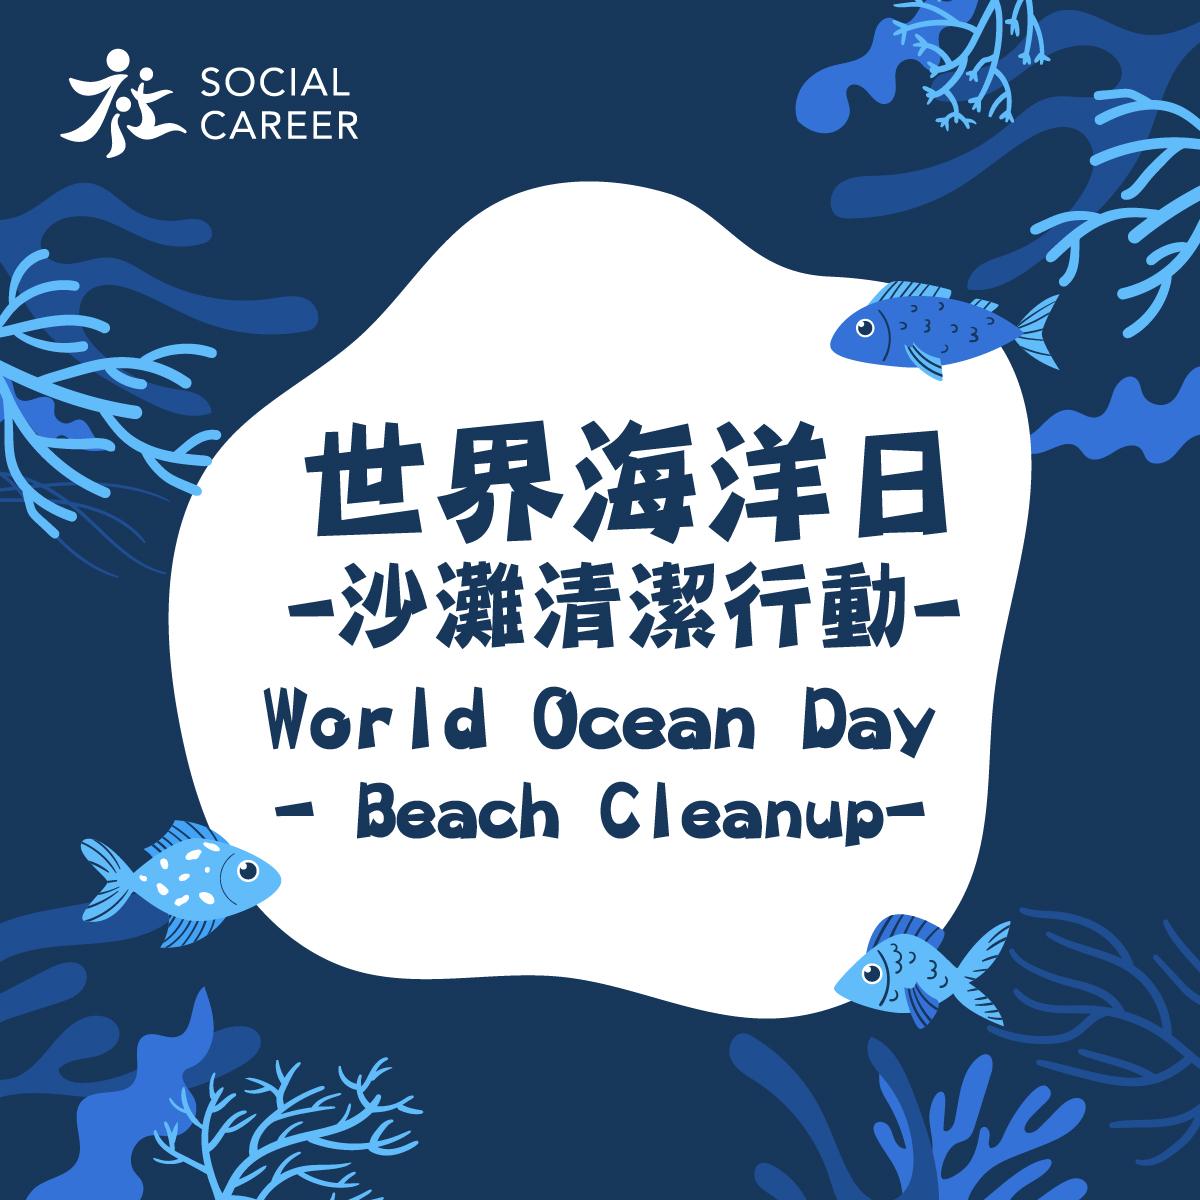 2021 World Ocean Day 世界海洋日 - 沙灘清潔行動社職